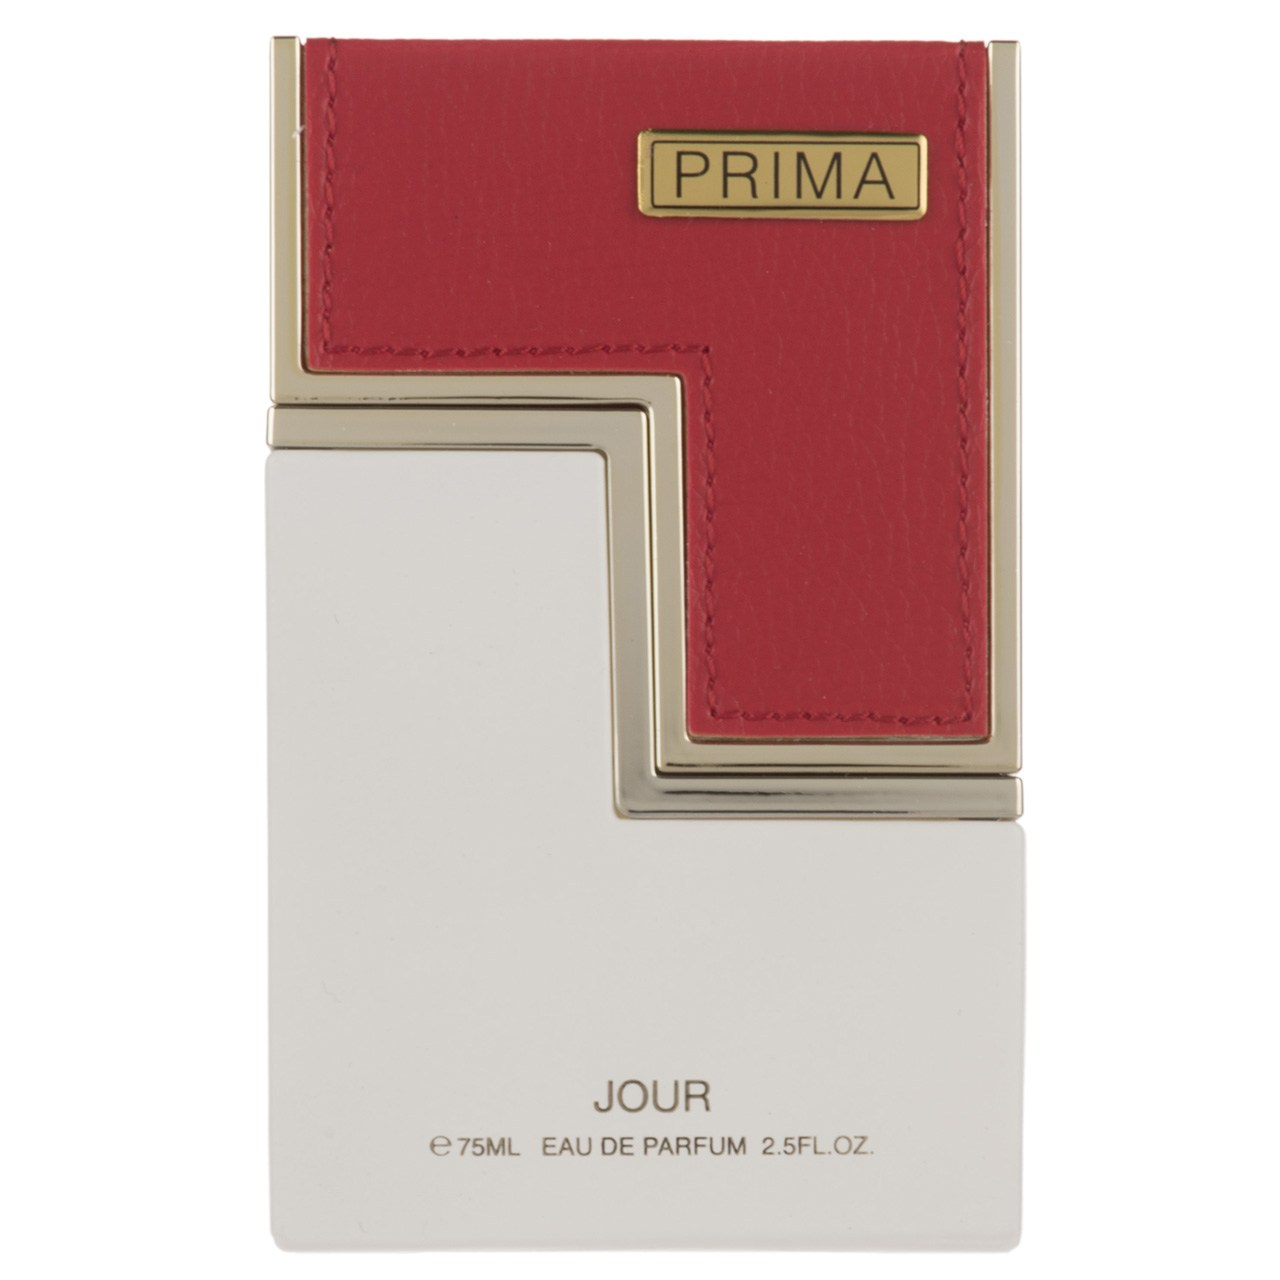 ادو پرفیوم زنانه امپر مدل Prima Jour حجم 75 میلی لیتر